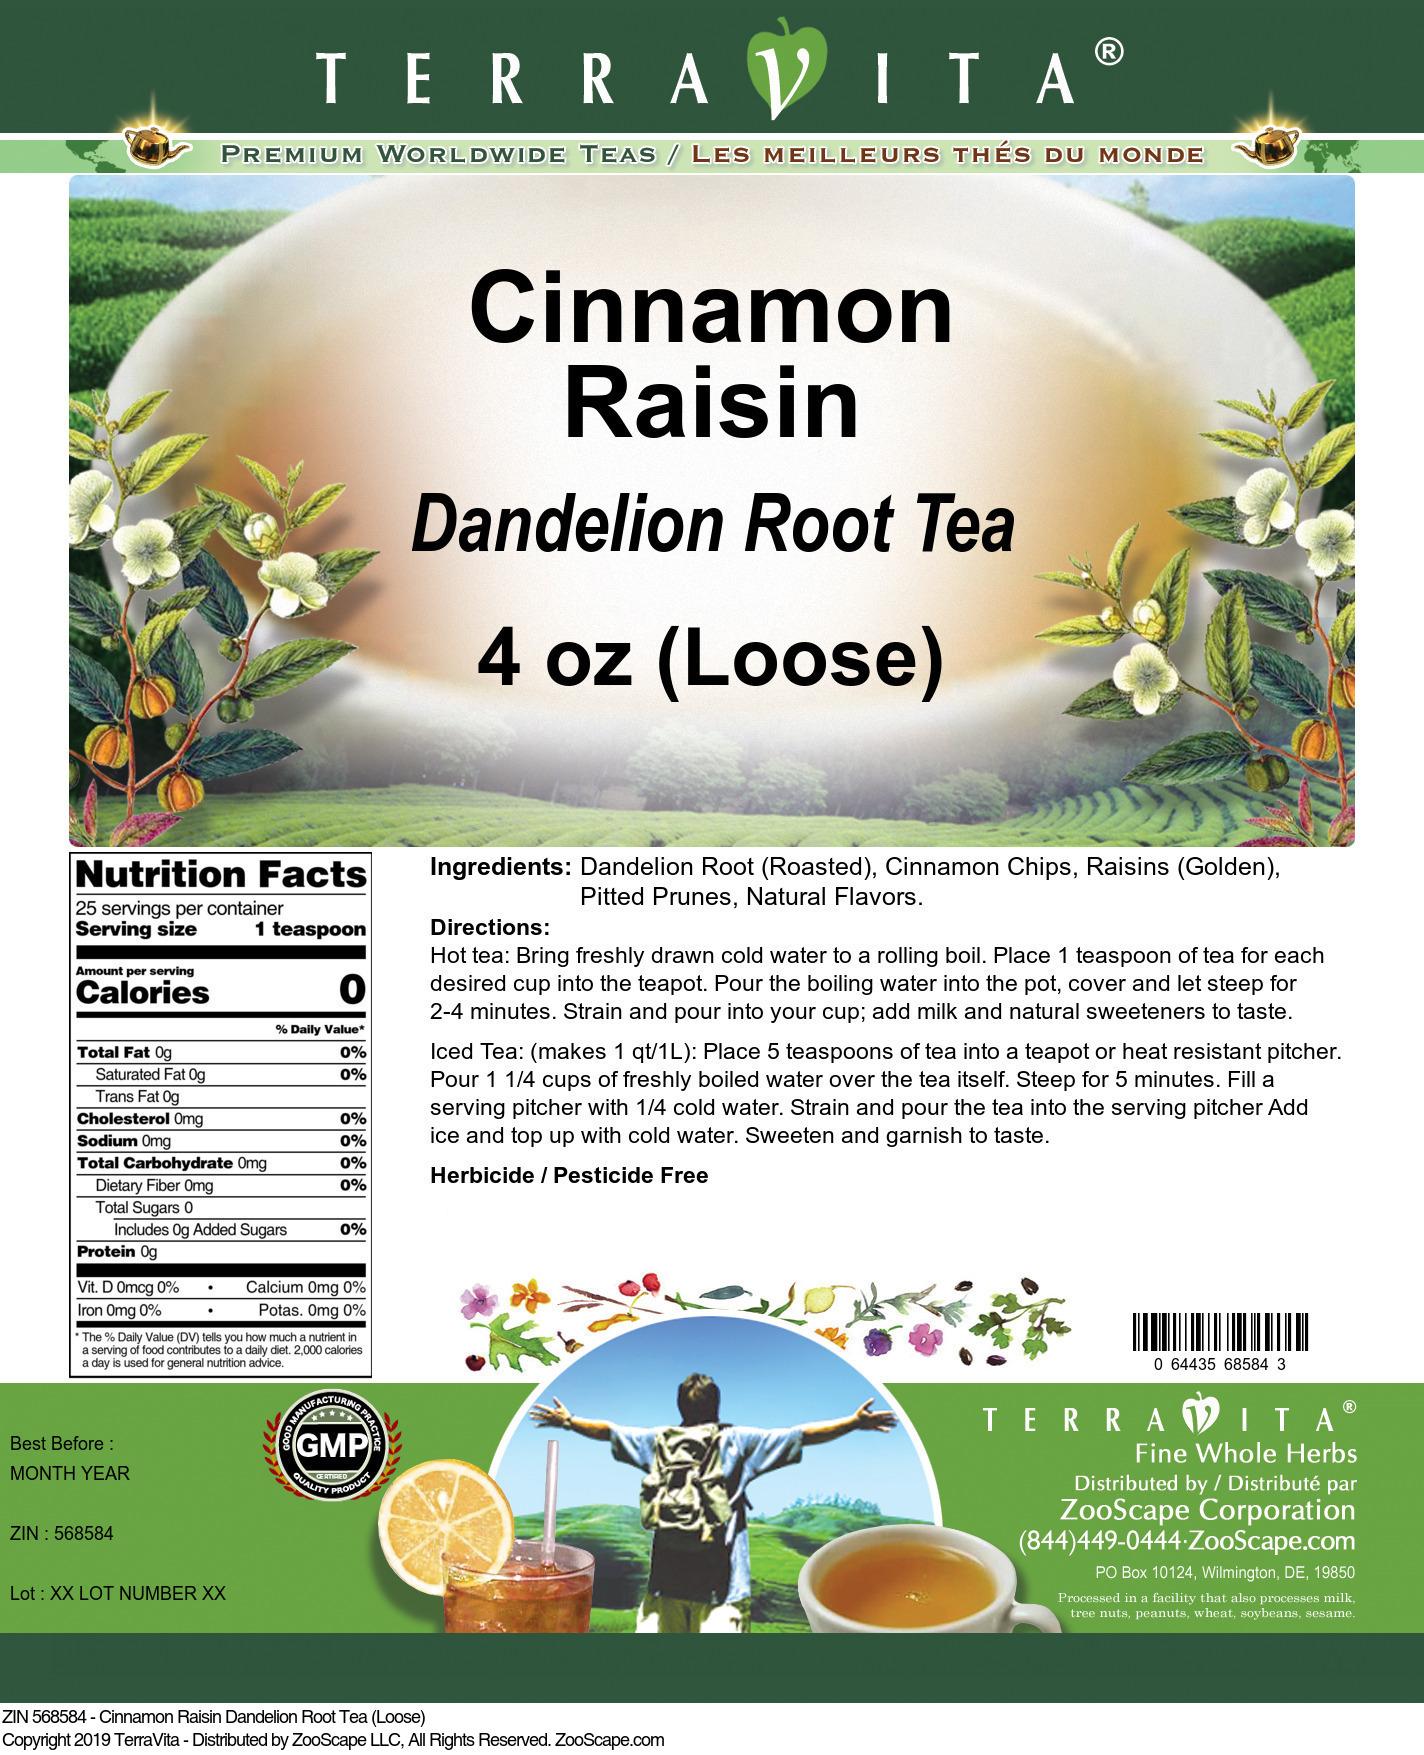 Cinnamon Raisin Dandelion Root Tea (Loose)